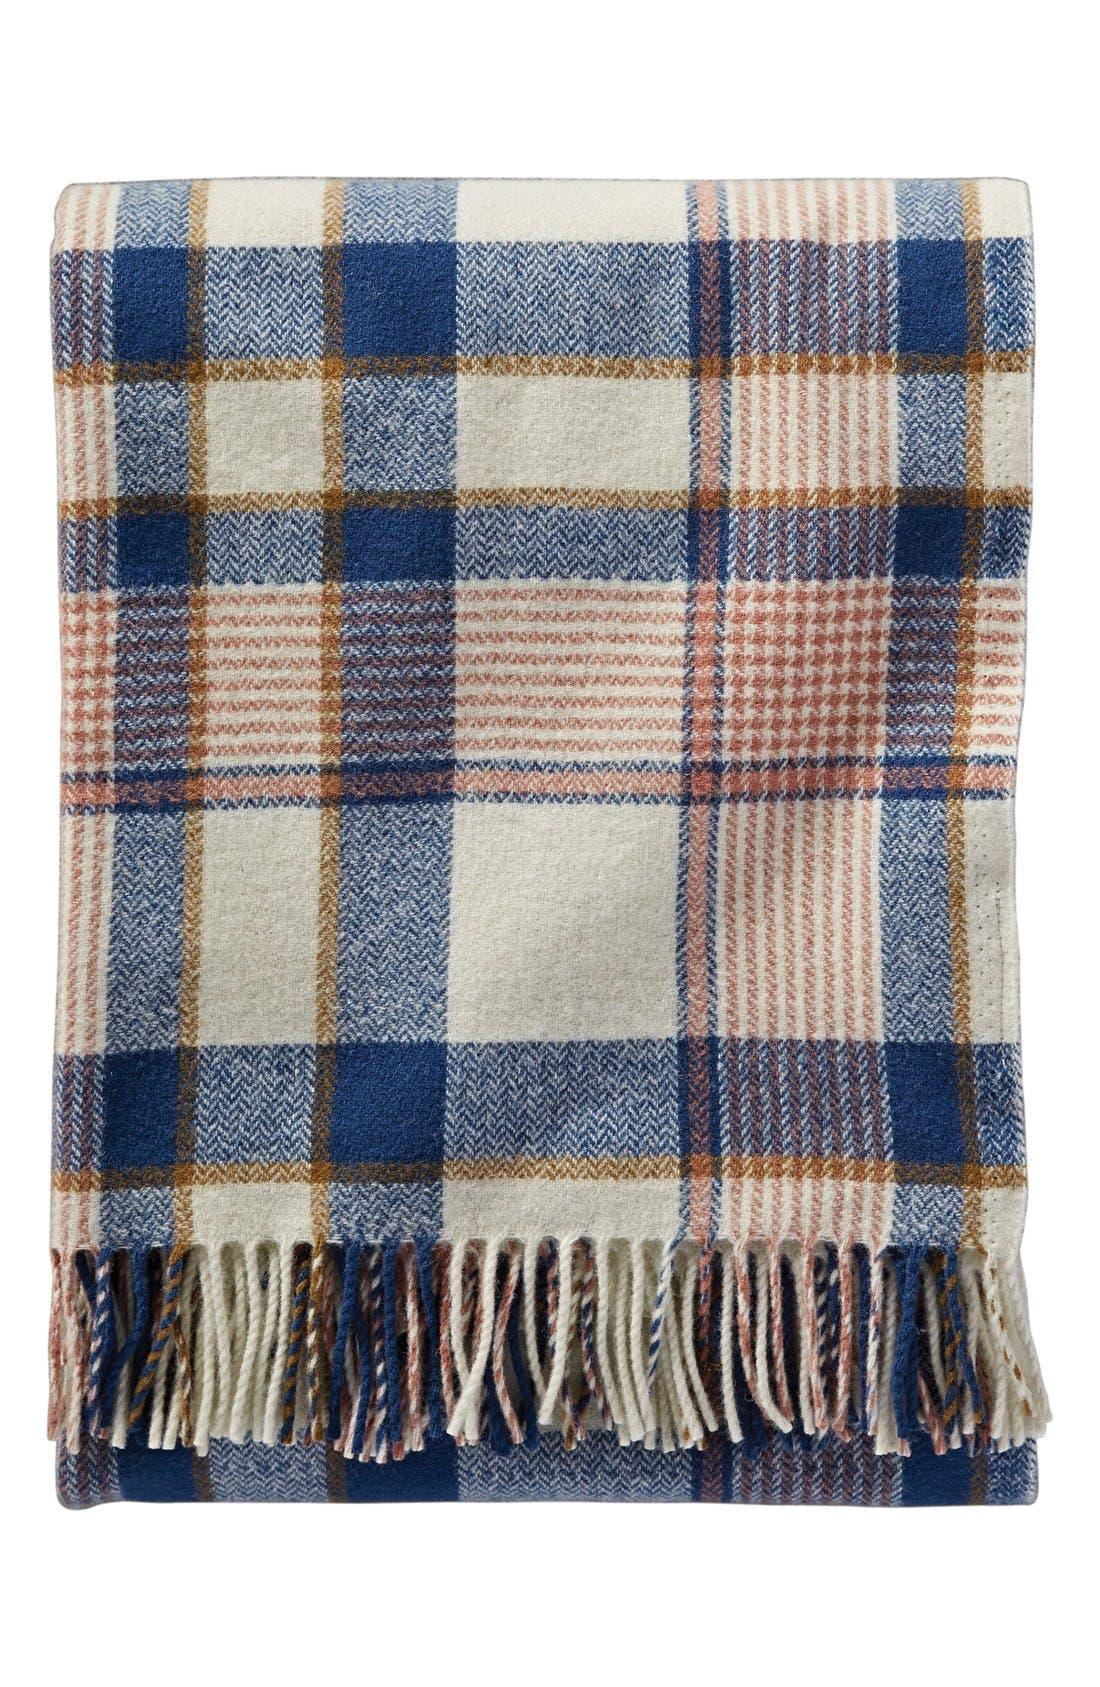 Main Image - Pendleton 'Hampshire Plaid' Throw Blanket & Carrier